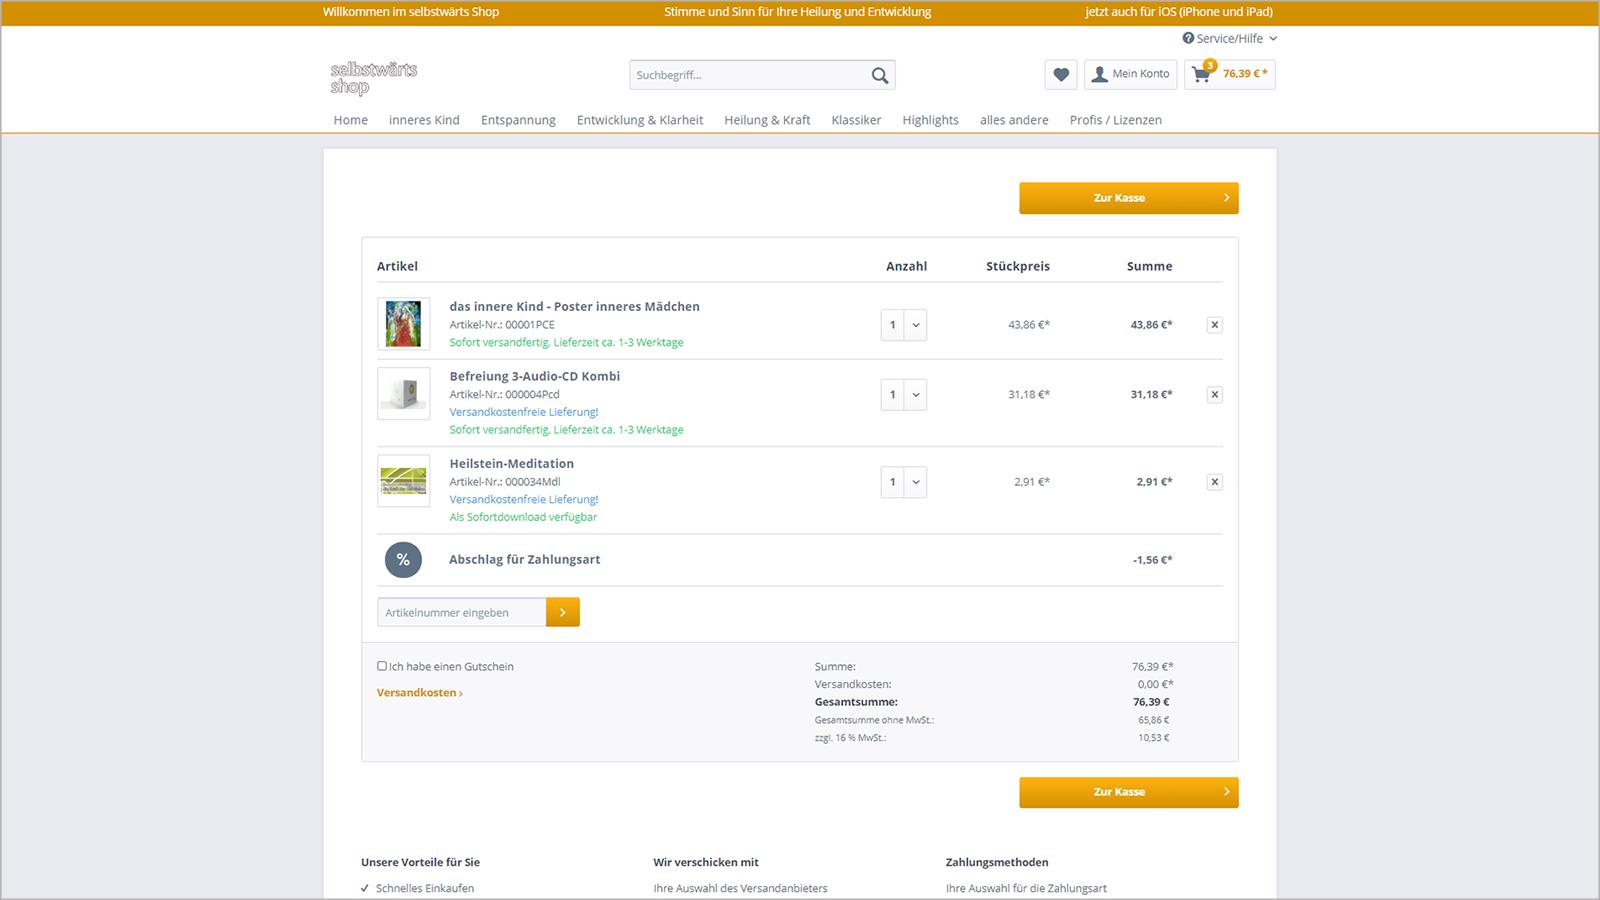 Screenshot Website Warenkorb - selbstwärtsshop